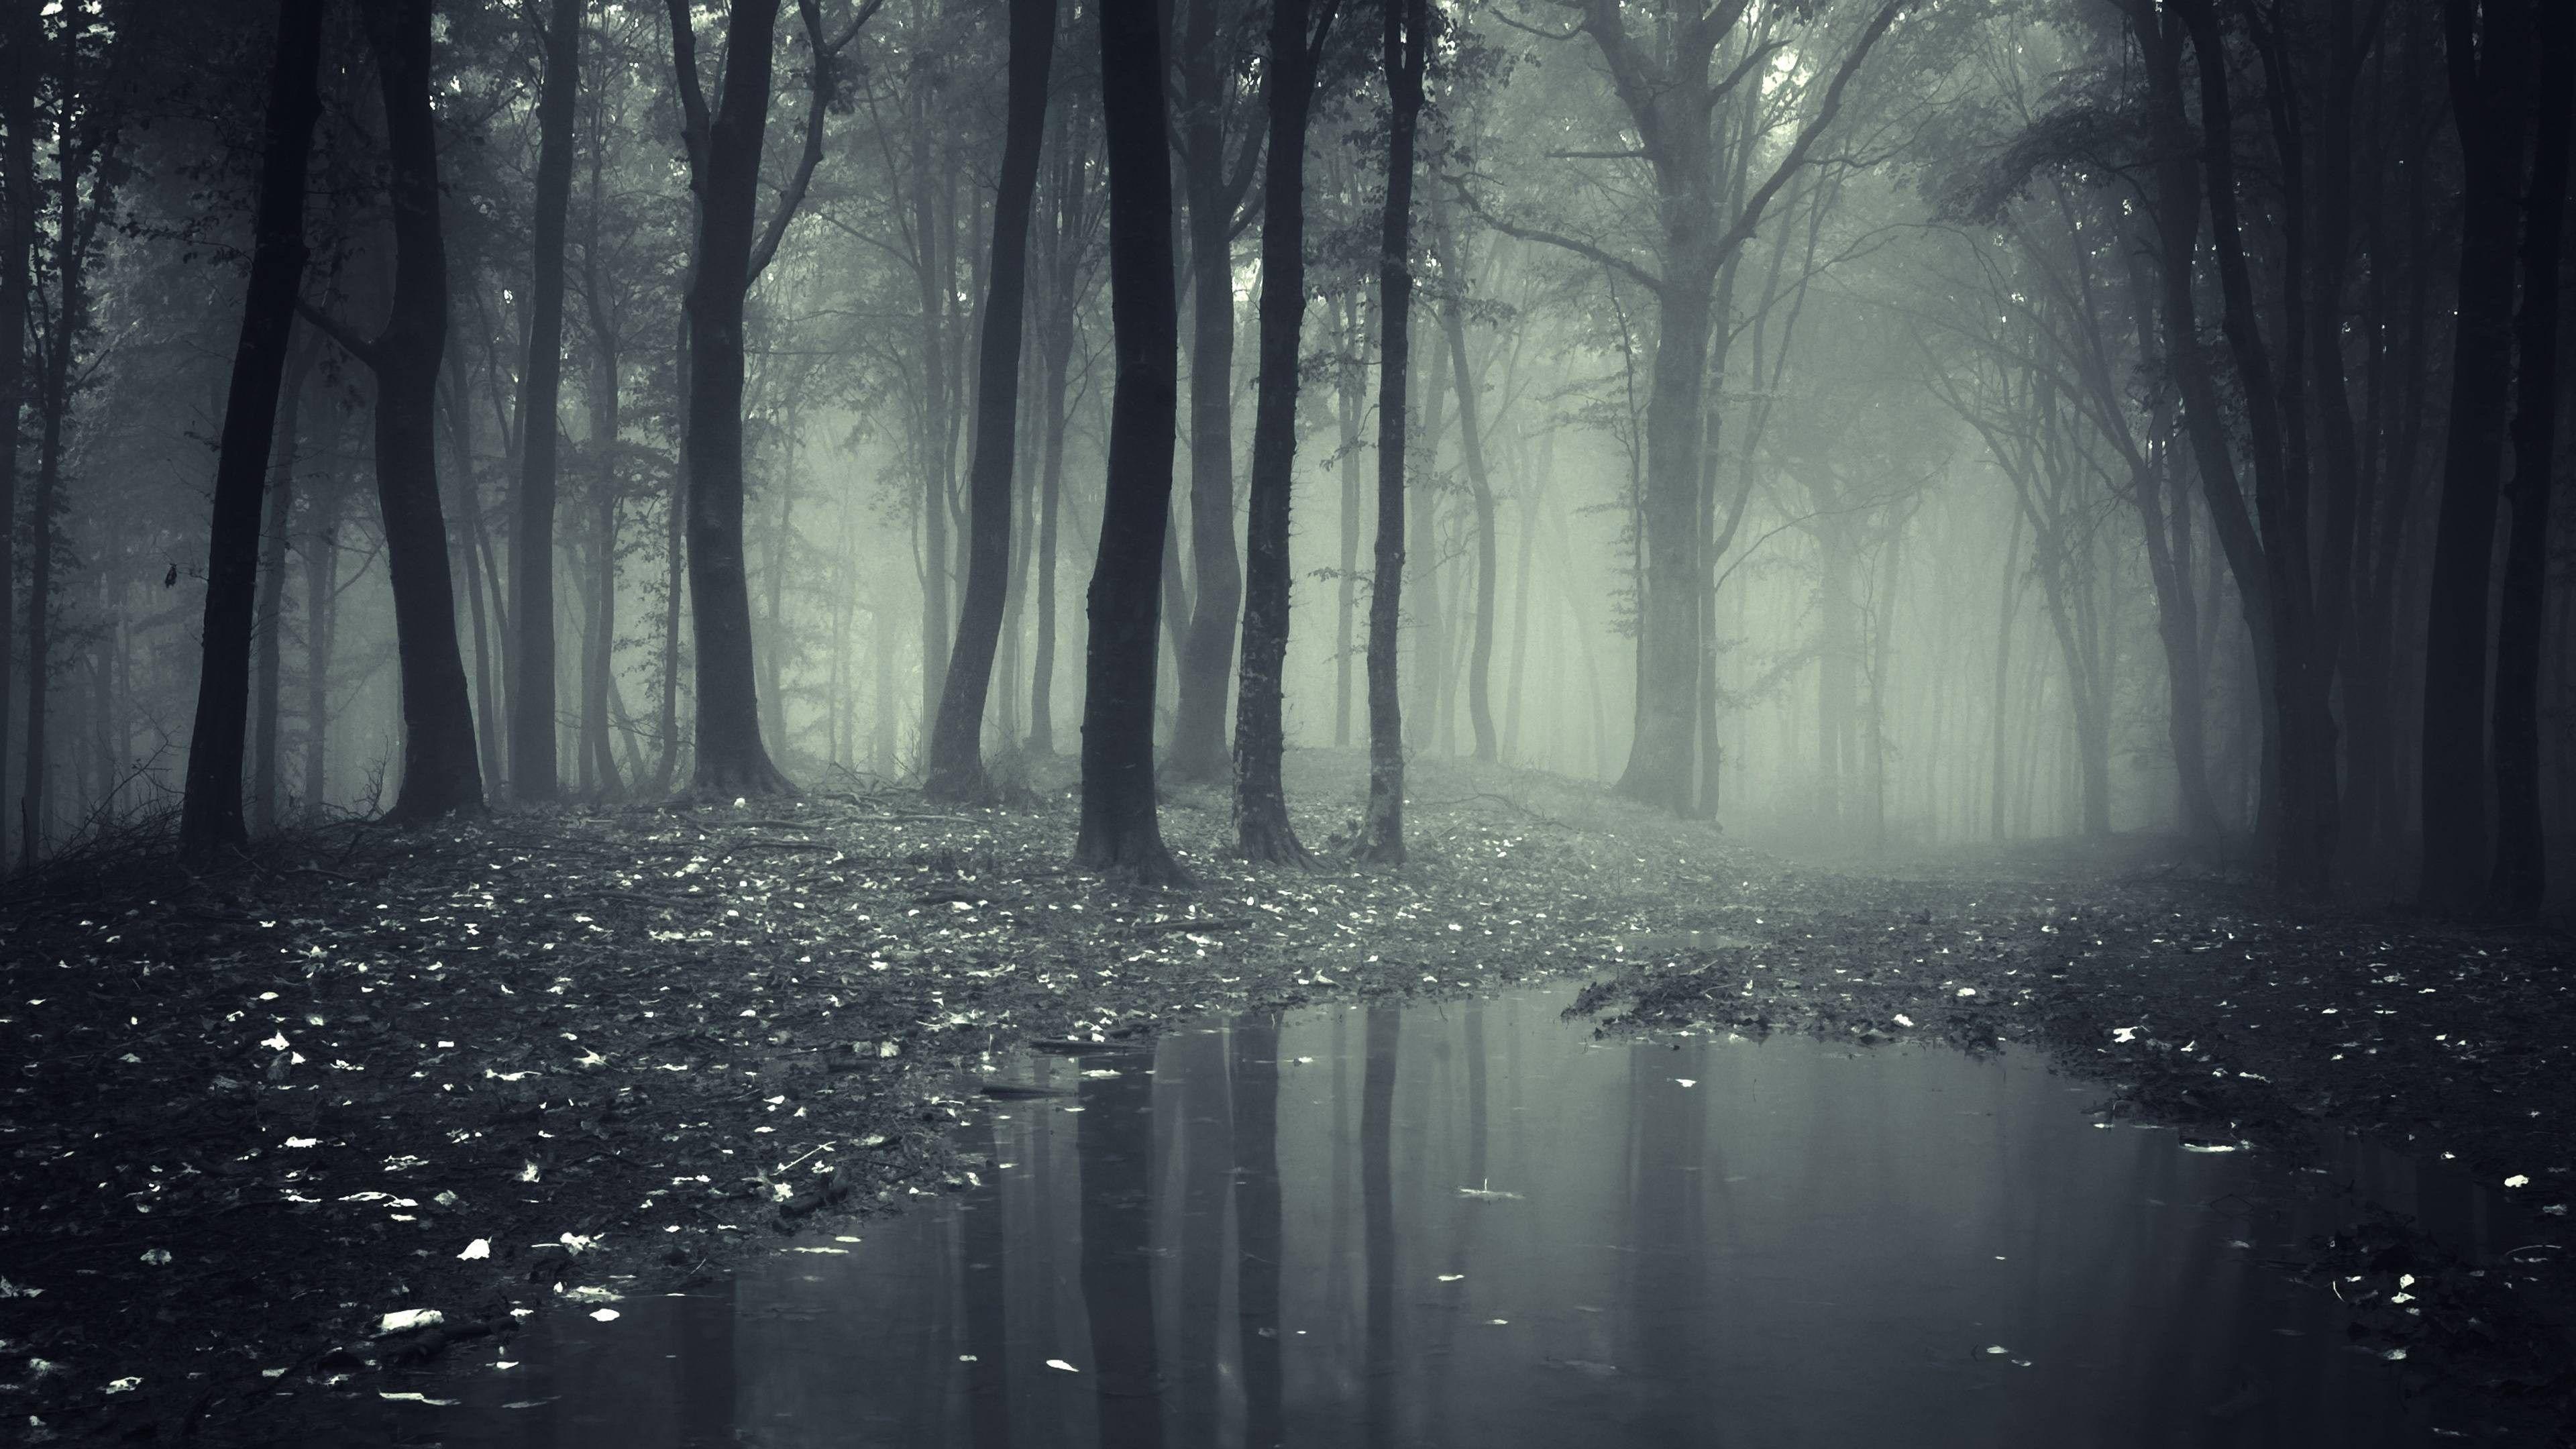 2016 09 12 Dark Forest Pic Desktop 18905 Forest Wallpaper Landscape Wallpaper Dark Wallpaper